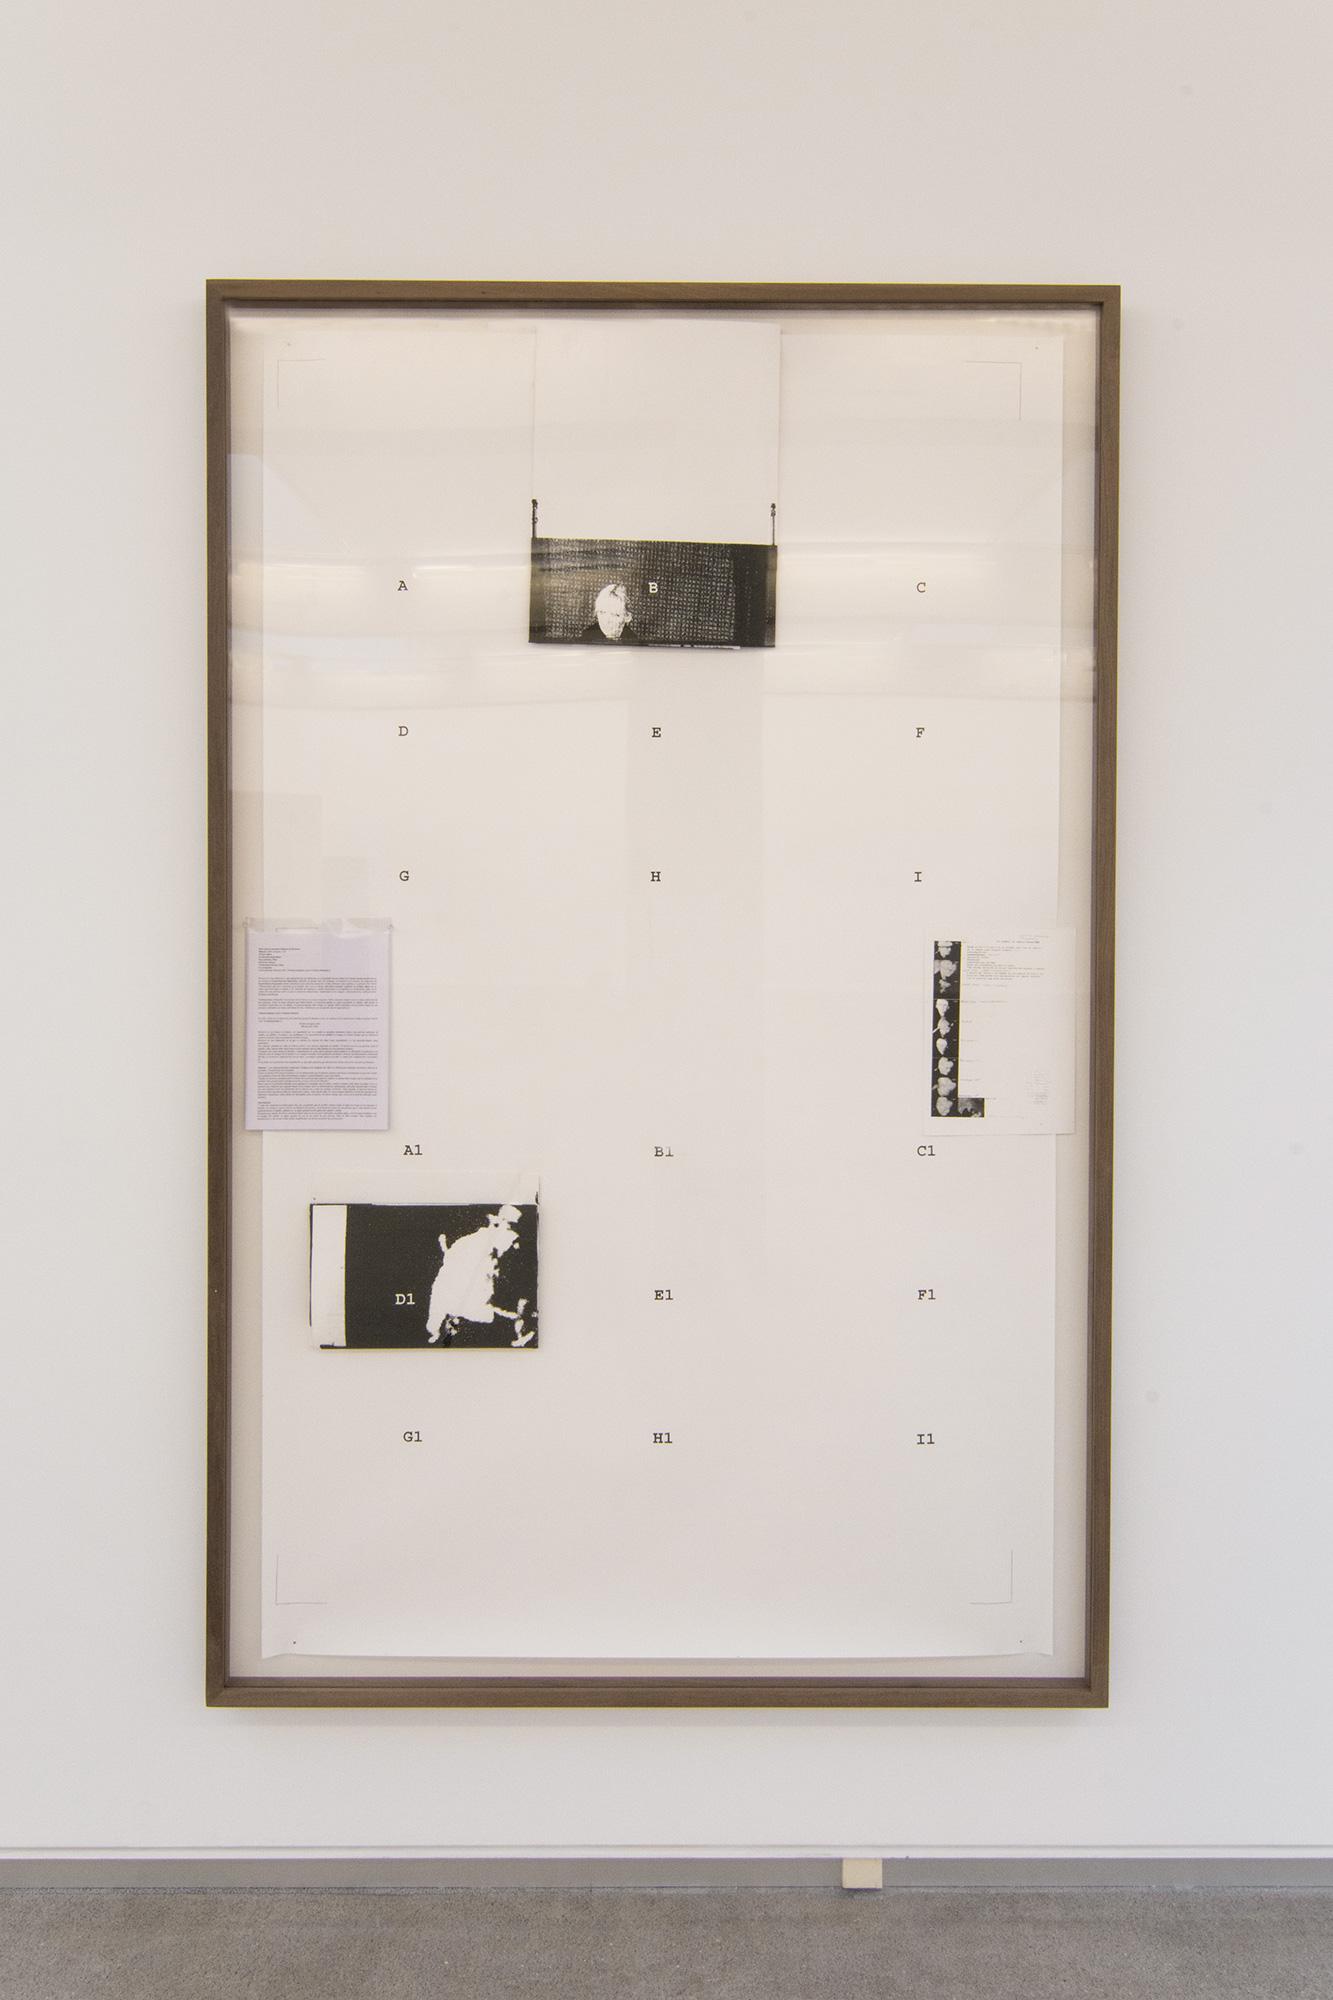 Jon Mikel Euba - Notación Adicional y Equivalencias